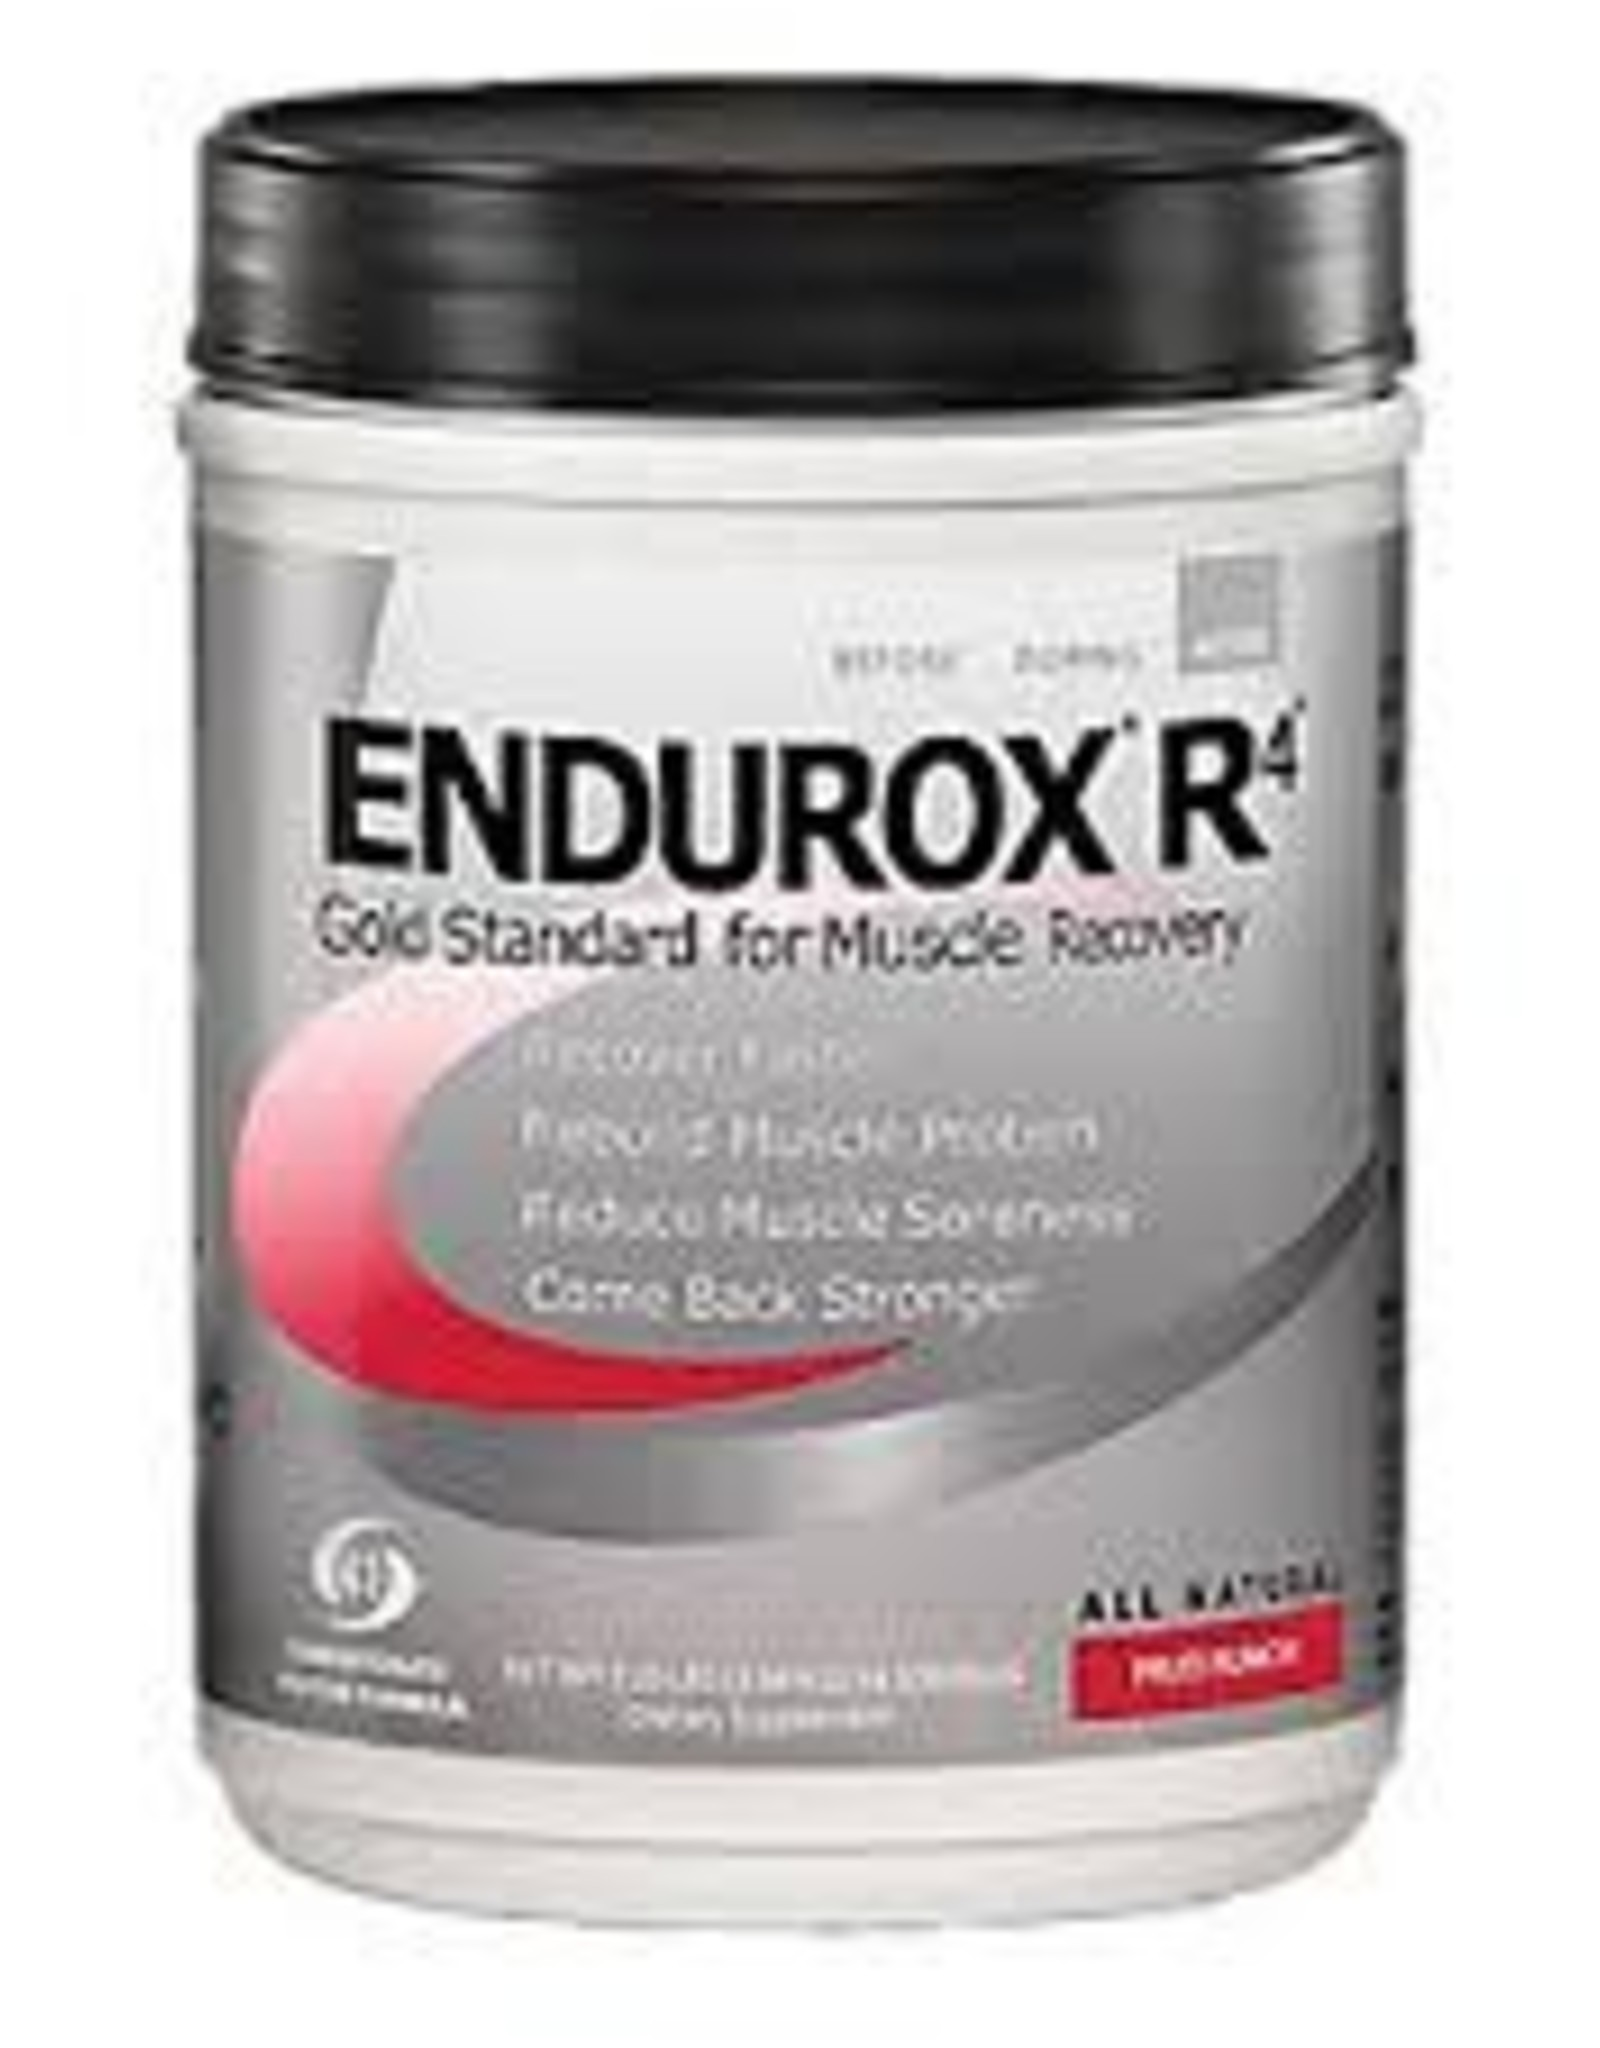 Pacific Health ENDUROX R4 REC FRUIT PU 14 SER